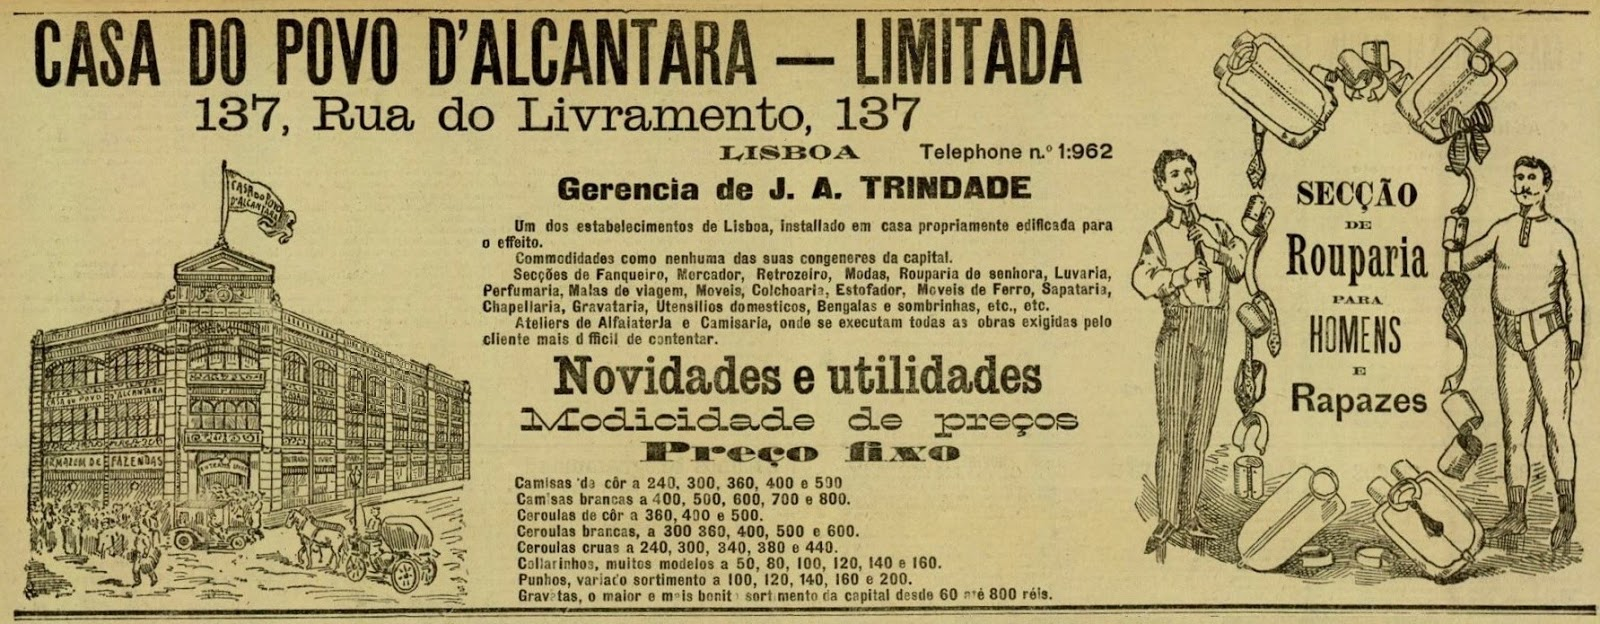 [1907-Casa-do-Povo-de-Alcntara-08-08]